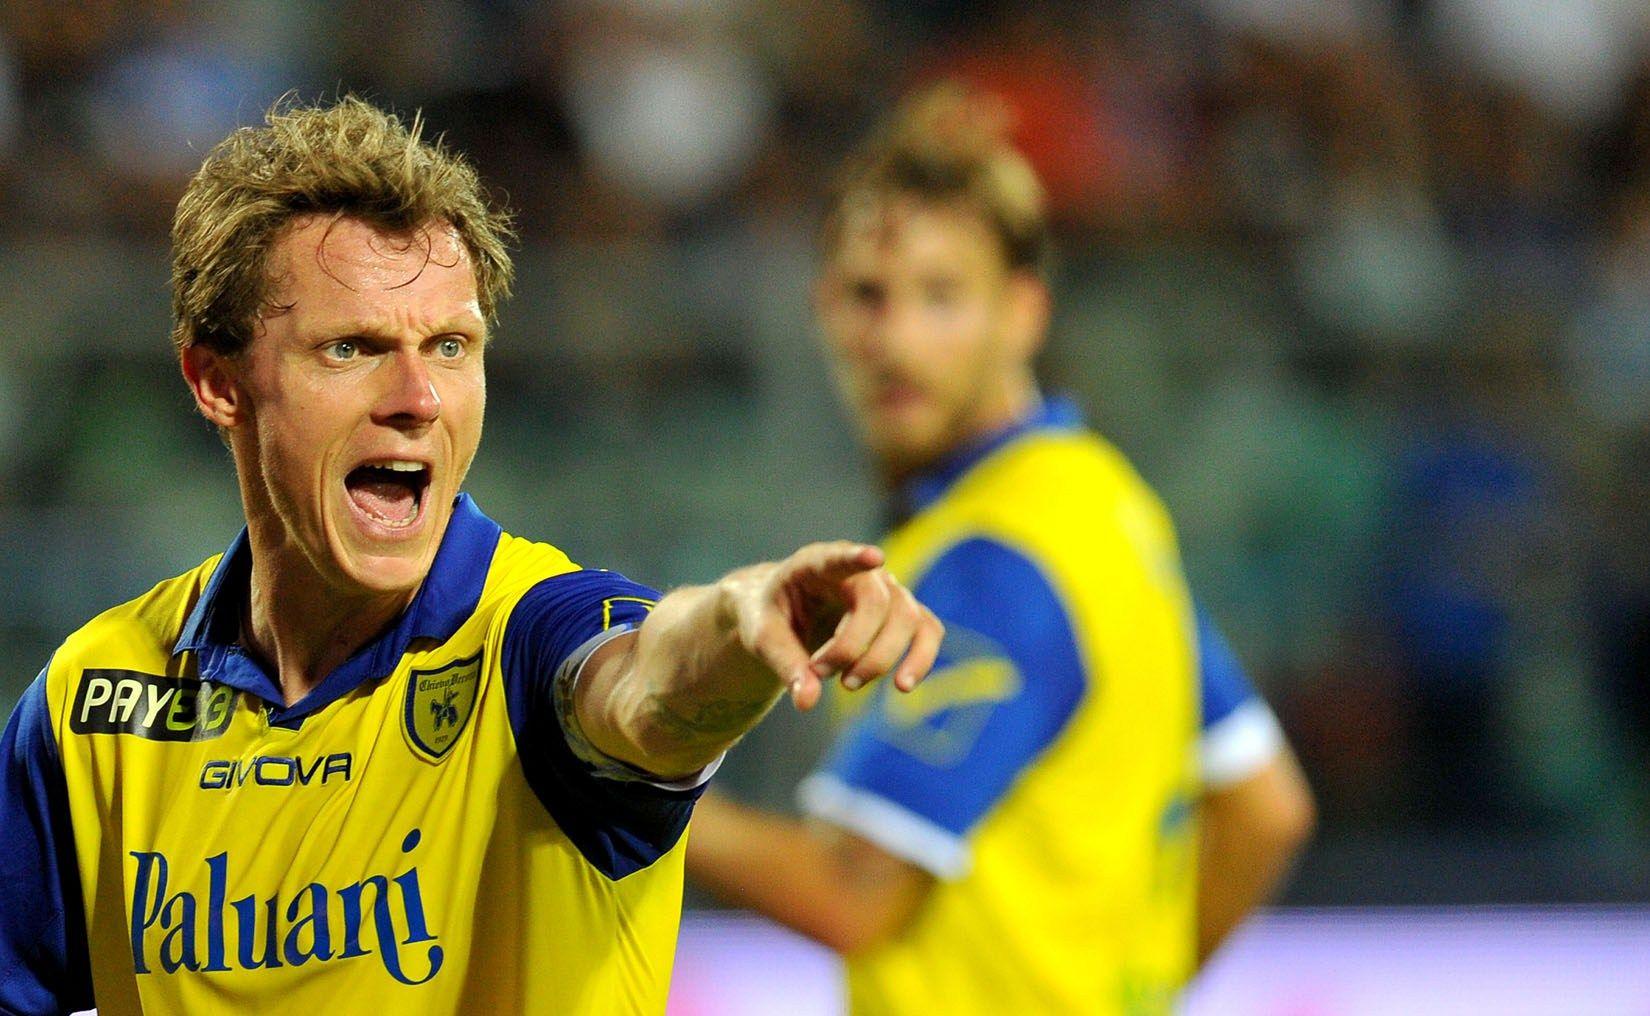 Lazio vs chievo betting experts turner broadcasting system csgo betting